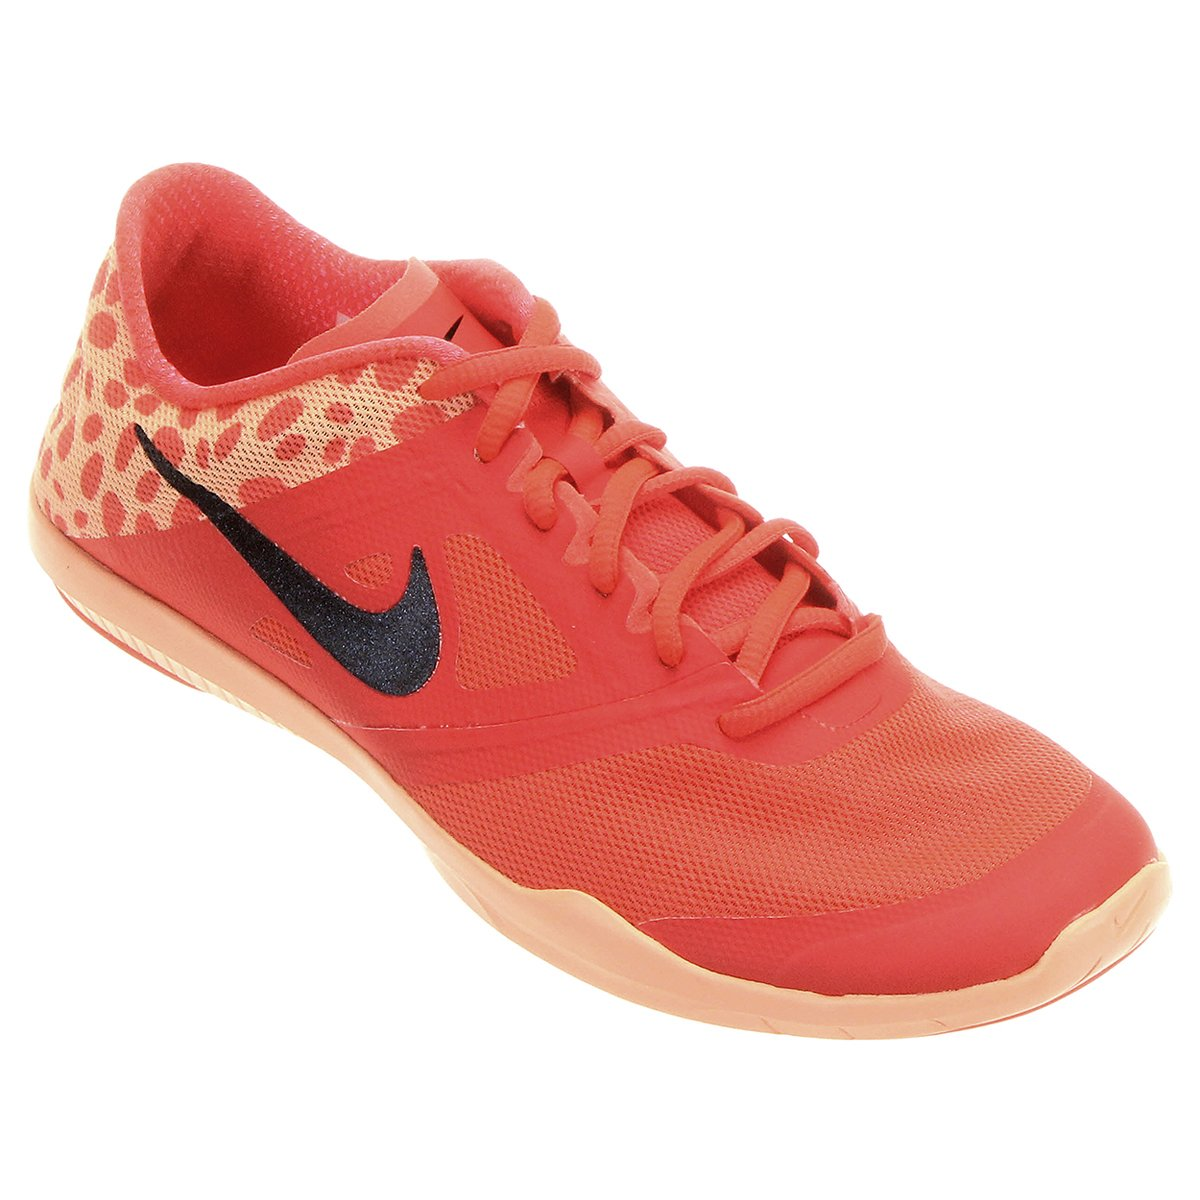 56116bb671c Tênis Nike Studio Trainer 2 Print Feminino - Compre Agora